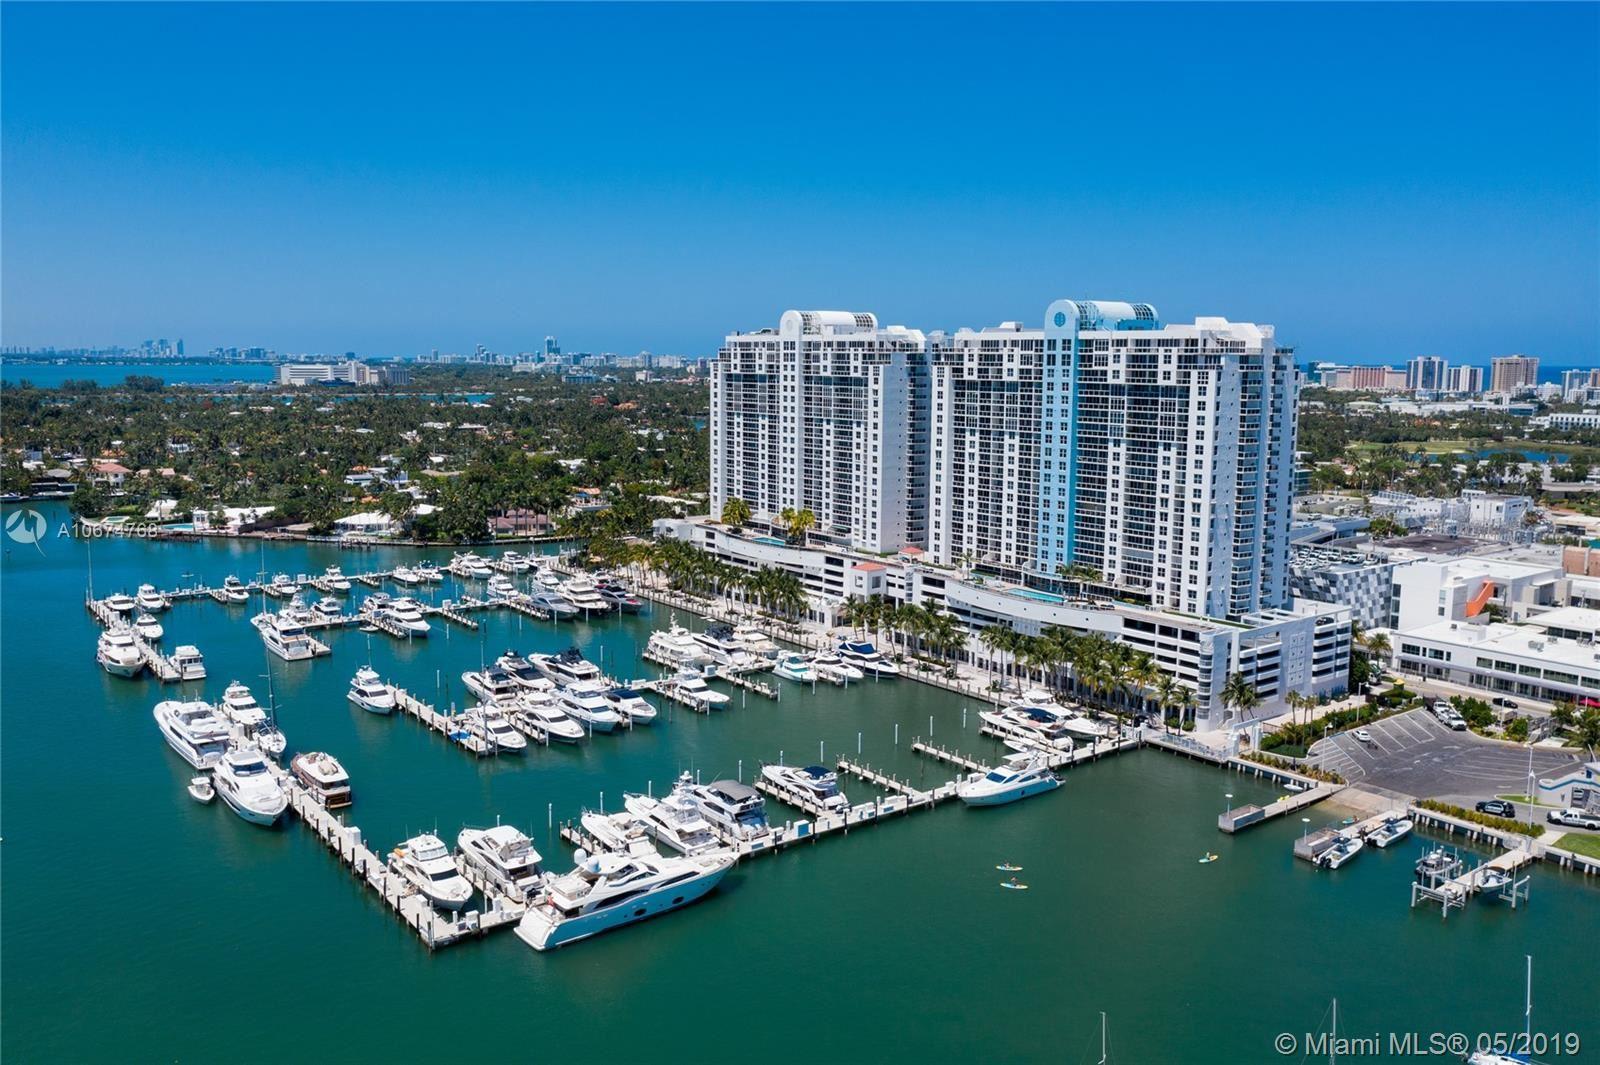 1800 Sunset Harbour Dr #1208, Miami Beach, FL 33139 - #: A10674768